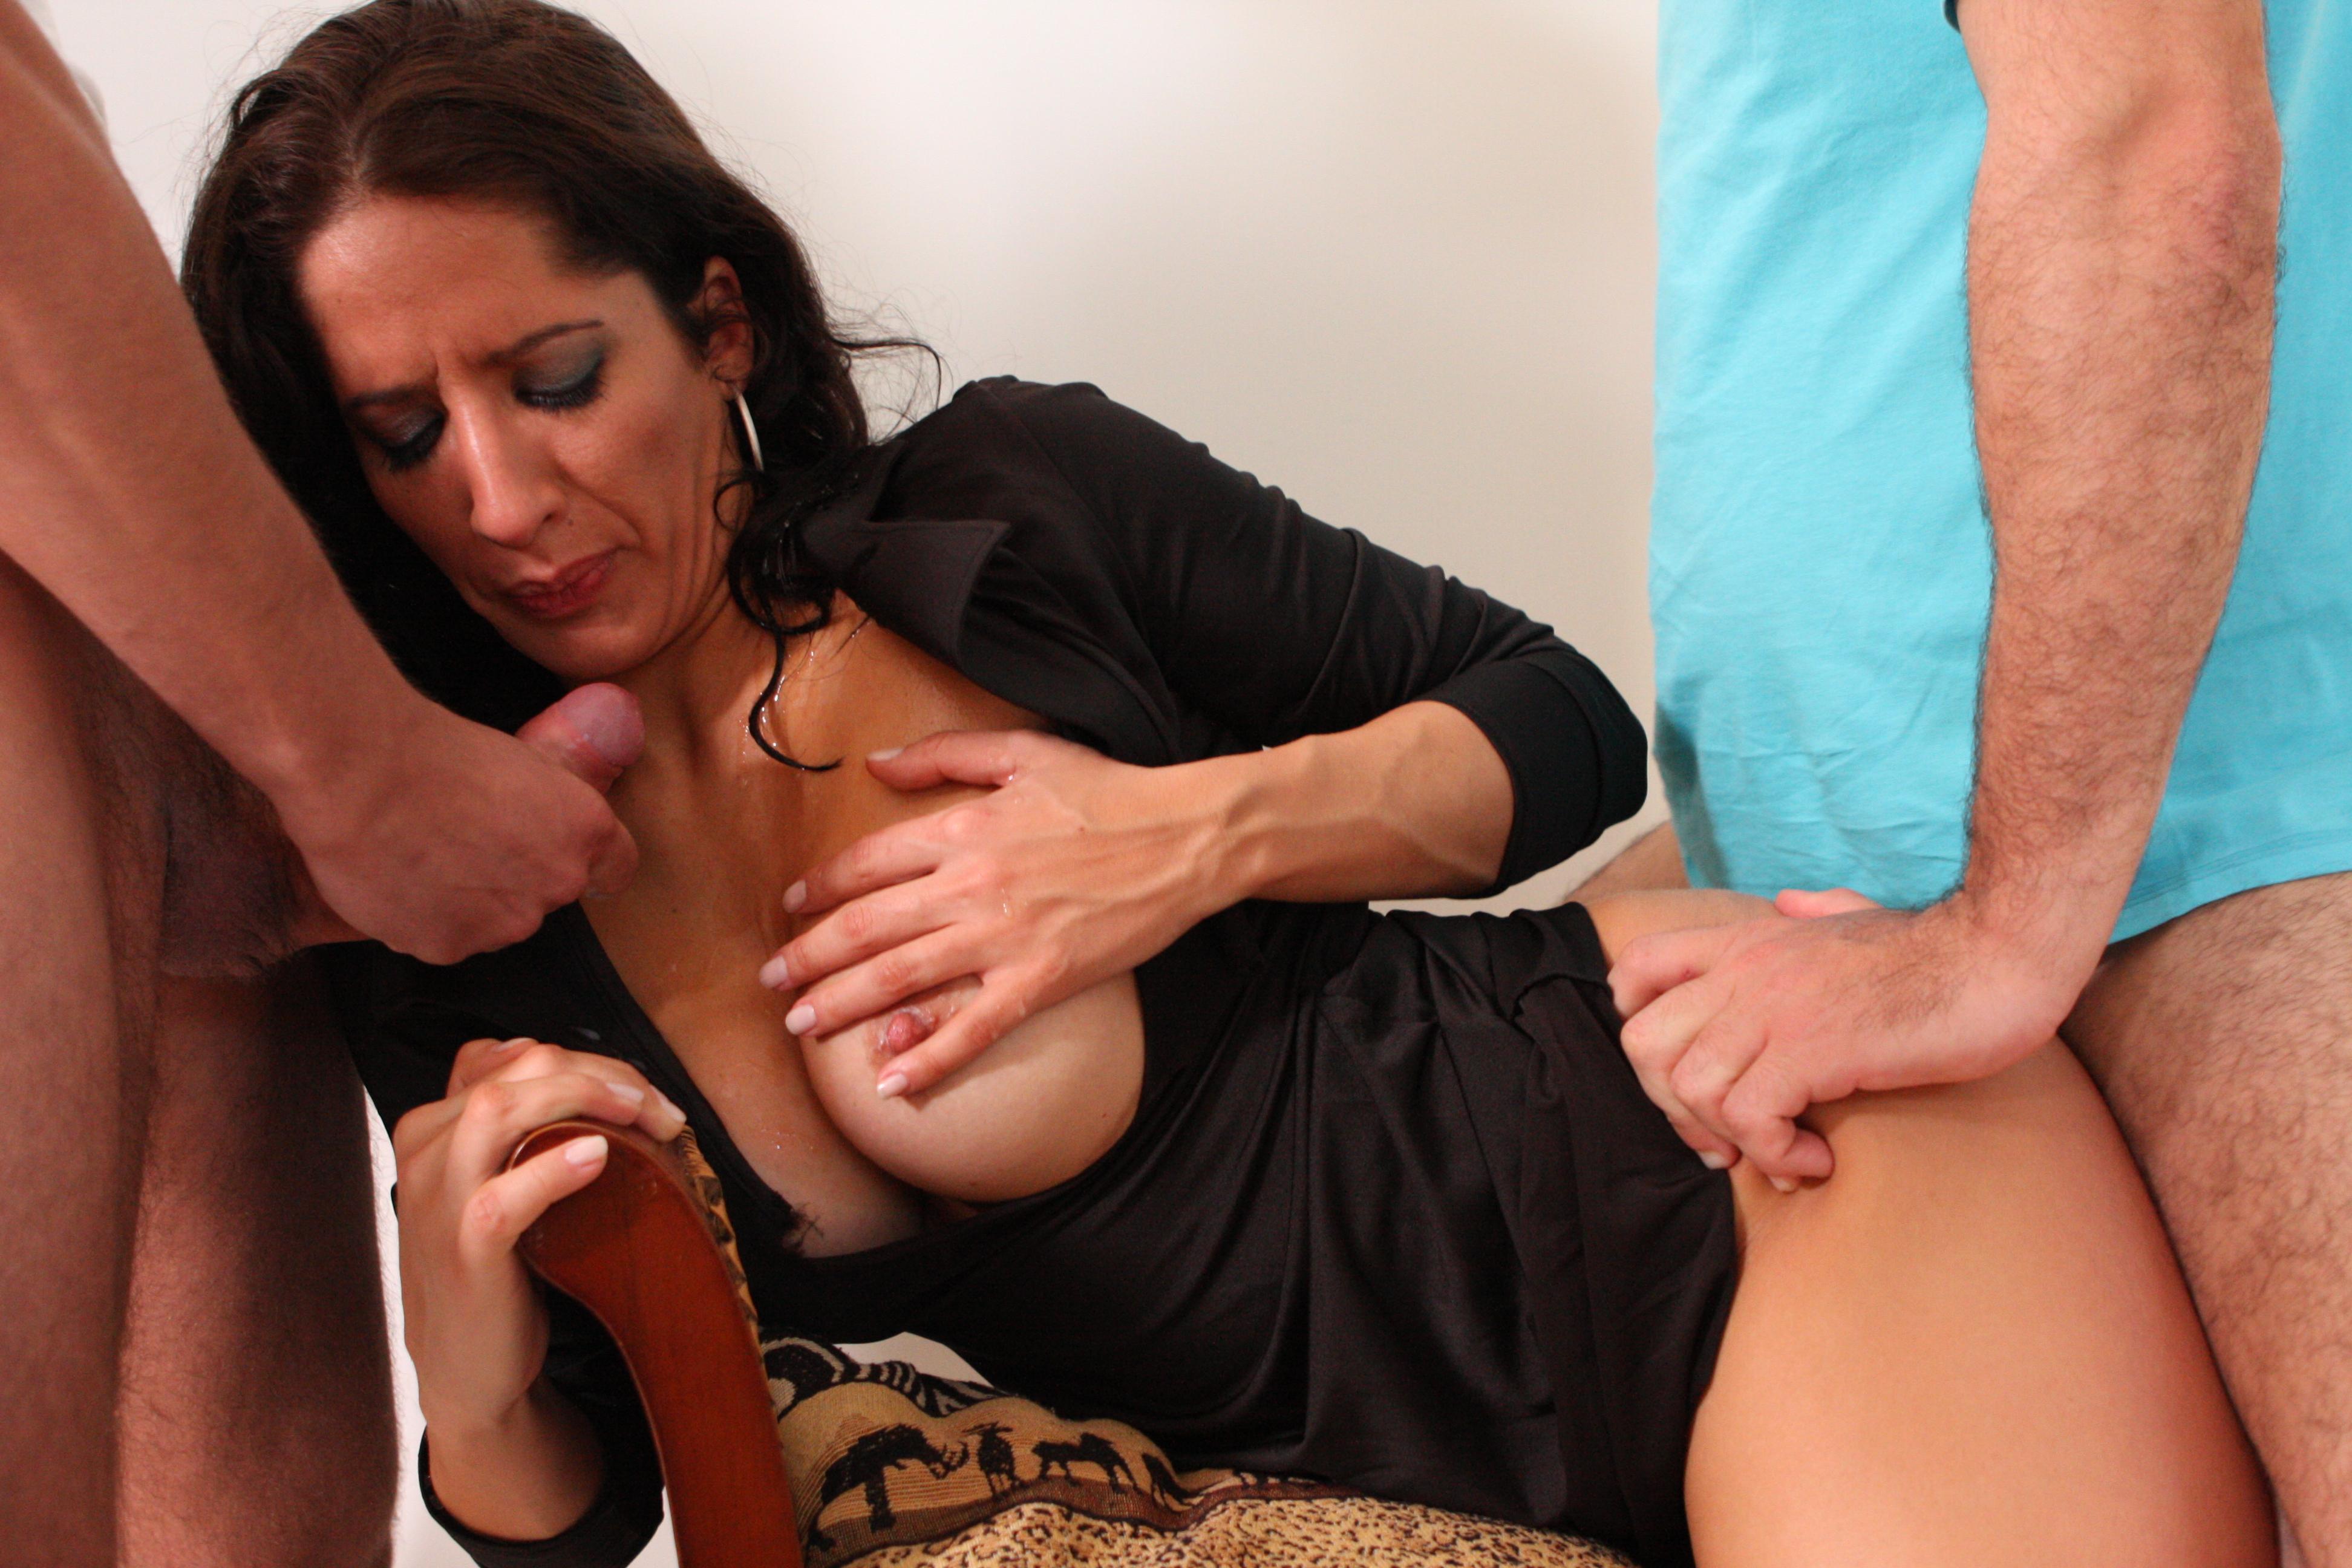 videos de sexo explicito doce massagens lisboa